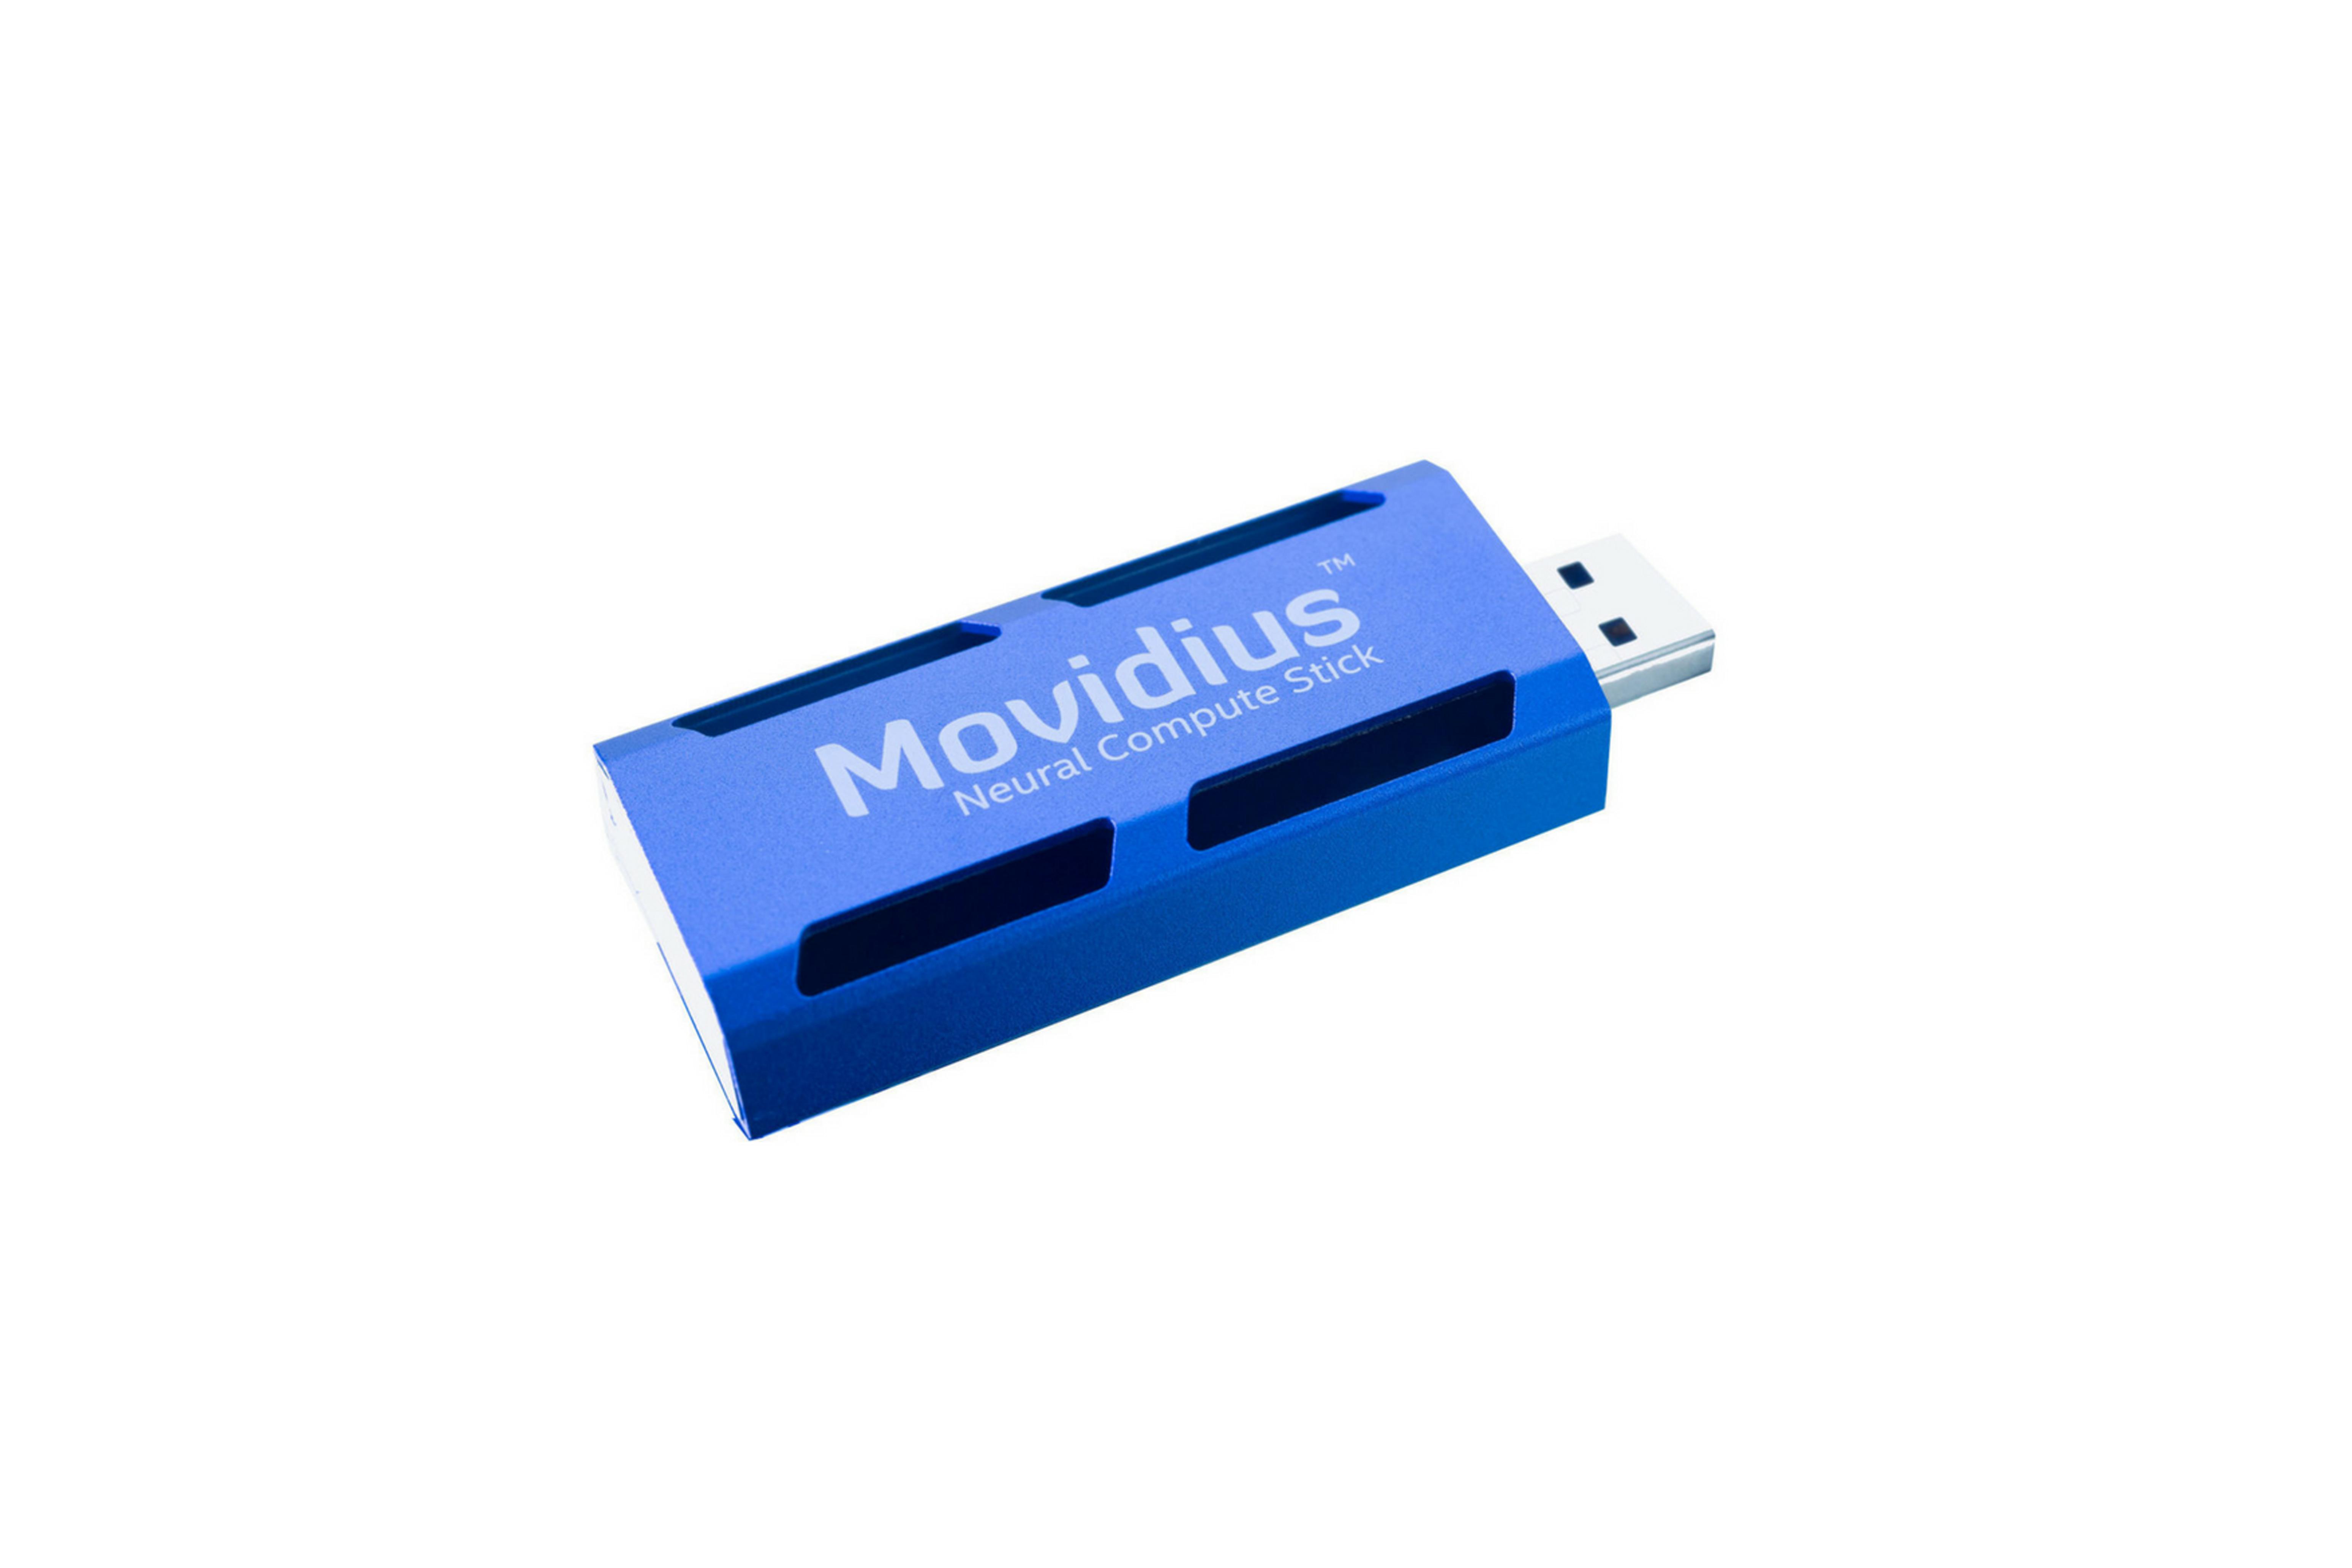 Movidius Neural Network Compute Stick